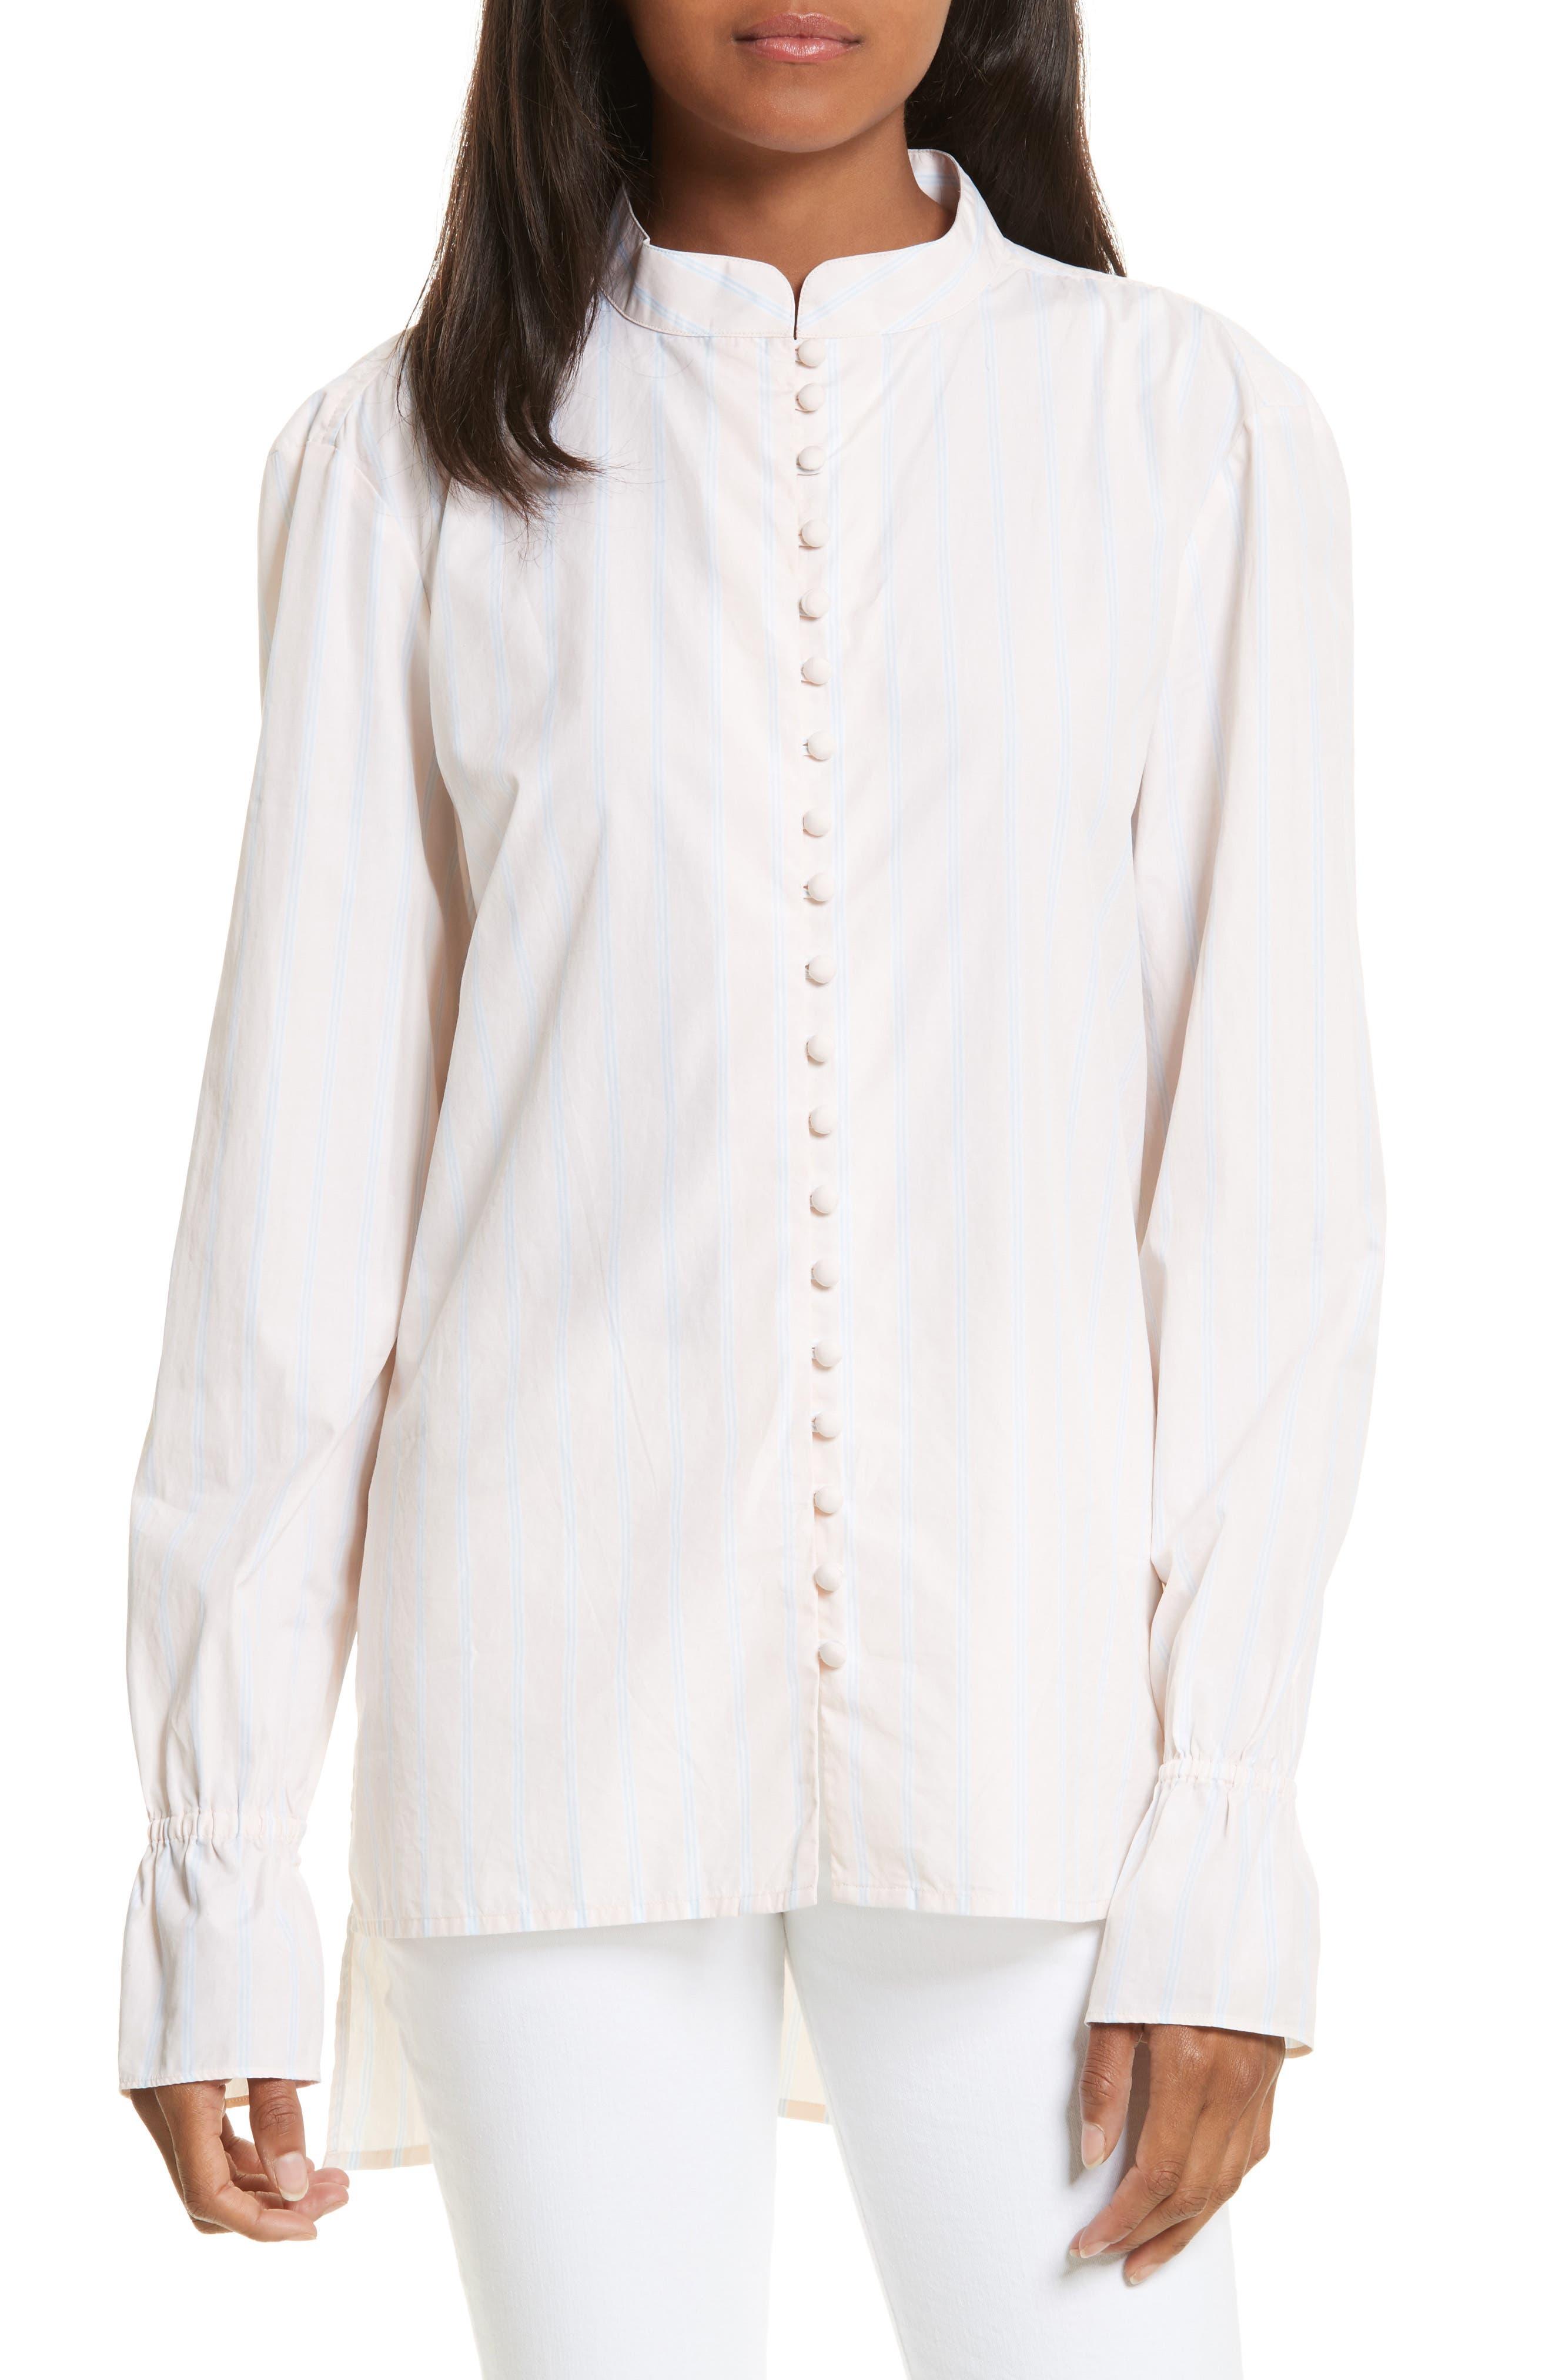 Main Image - FRAME Ruffle Cuff Cotton Shirt